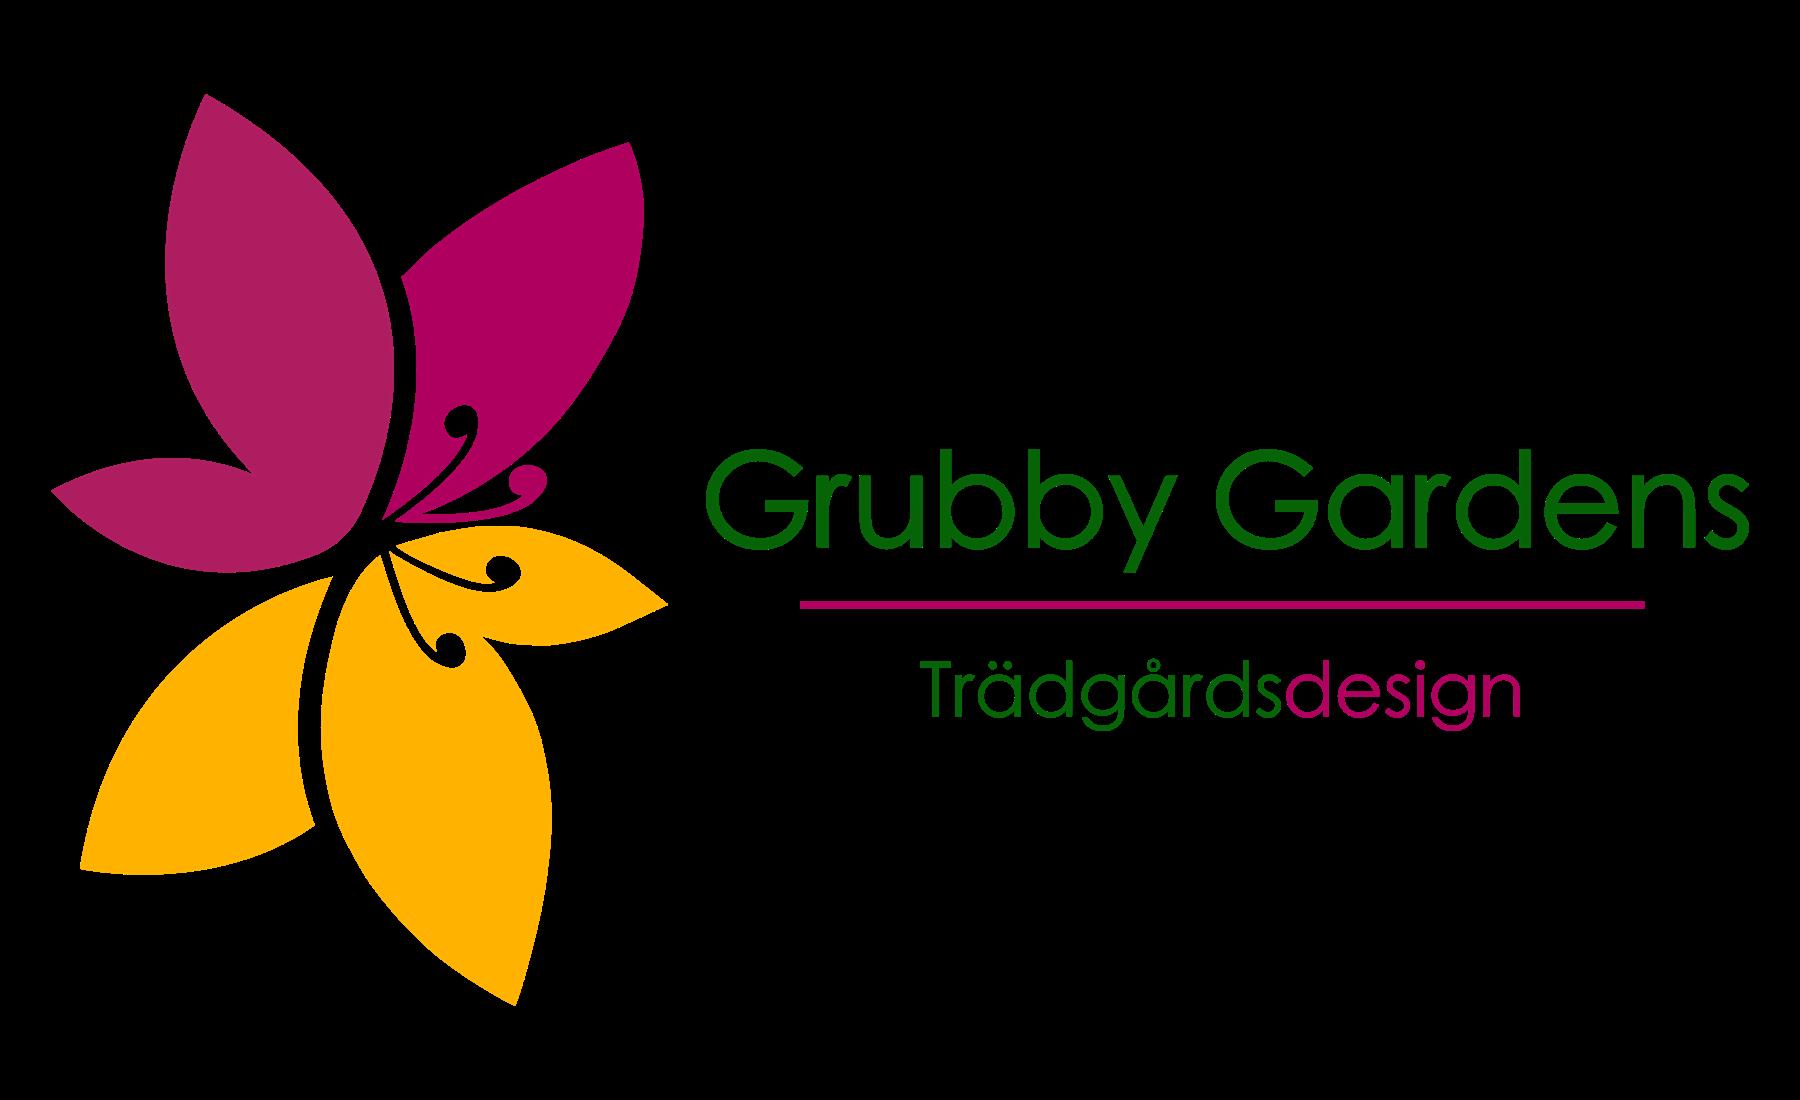 Grubby Gardens